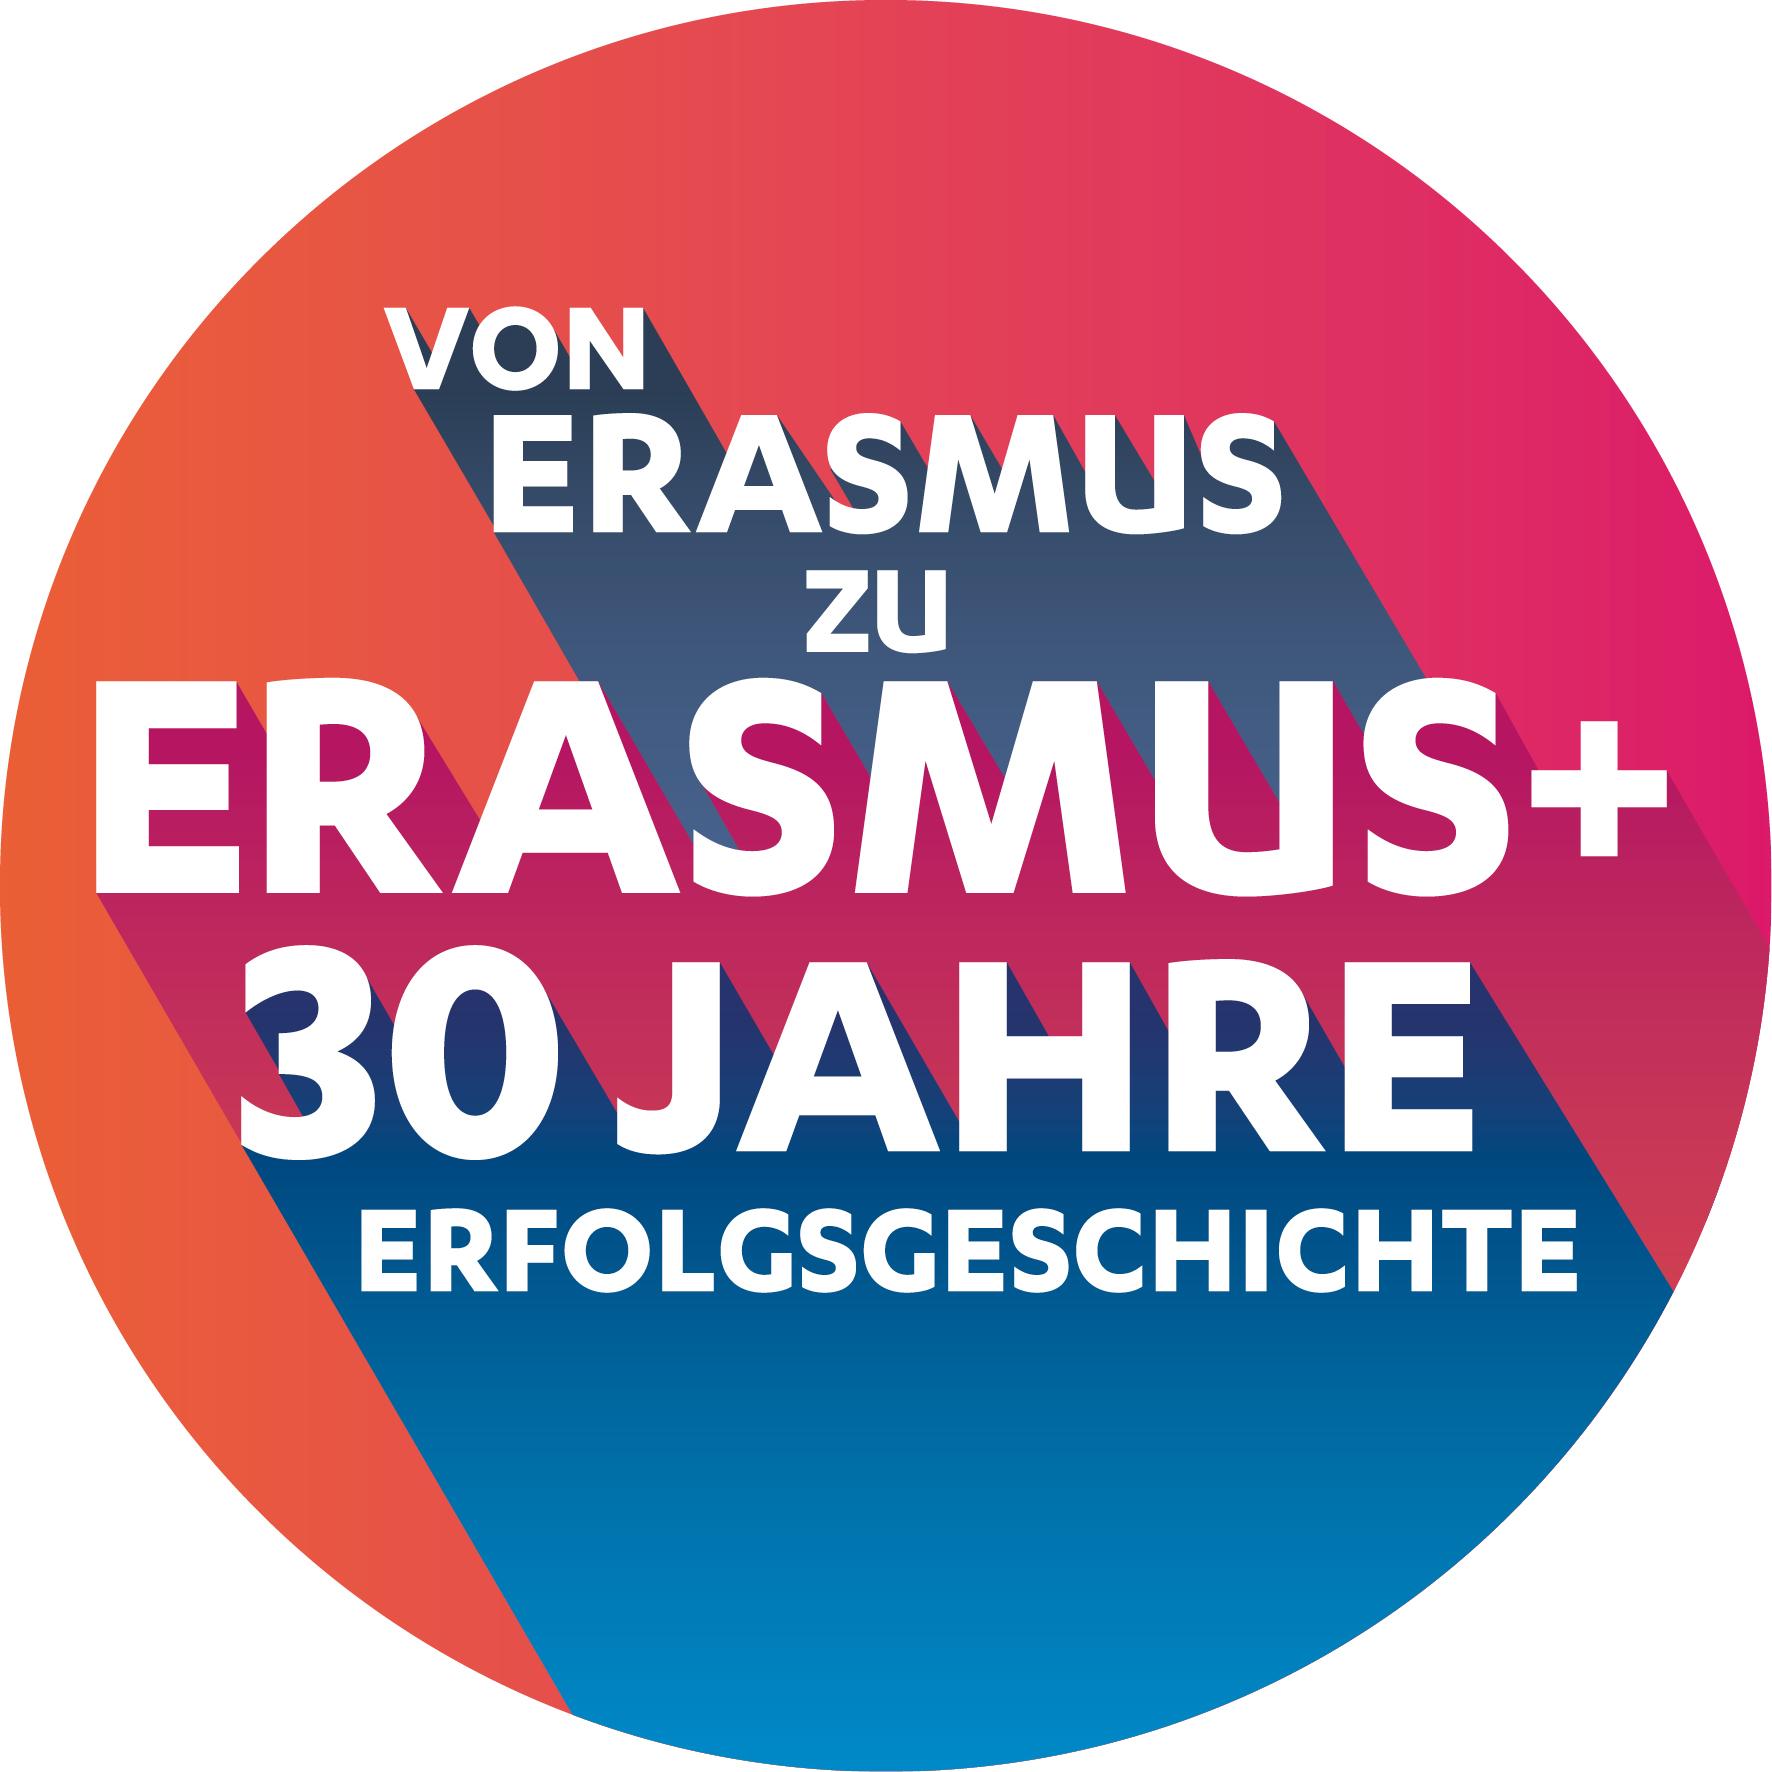 ErasmusPlus-30years-Circle-DE-300dpi